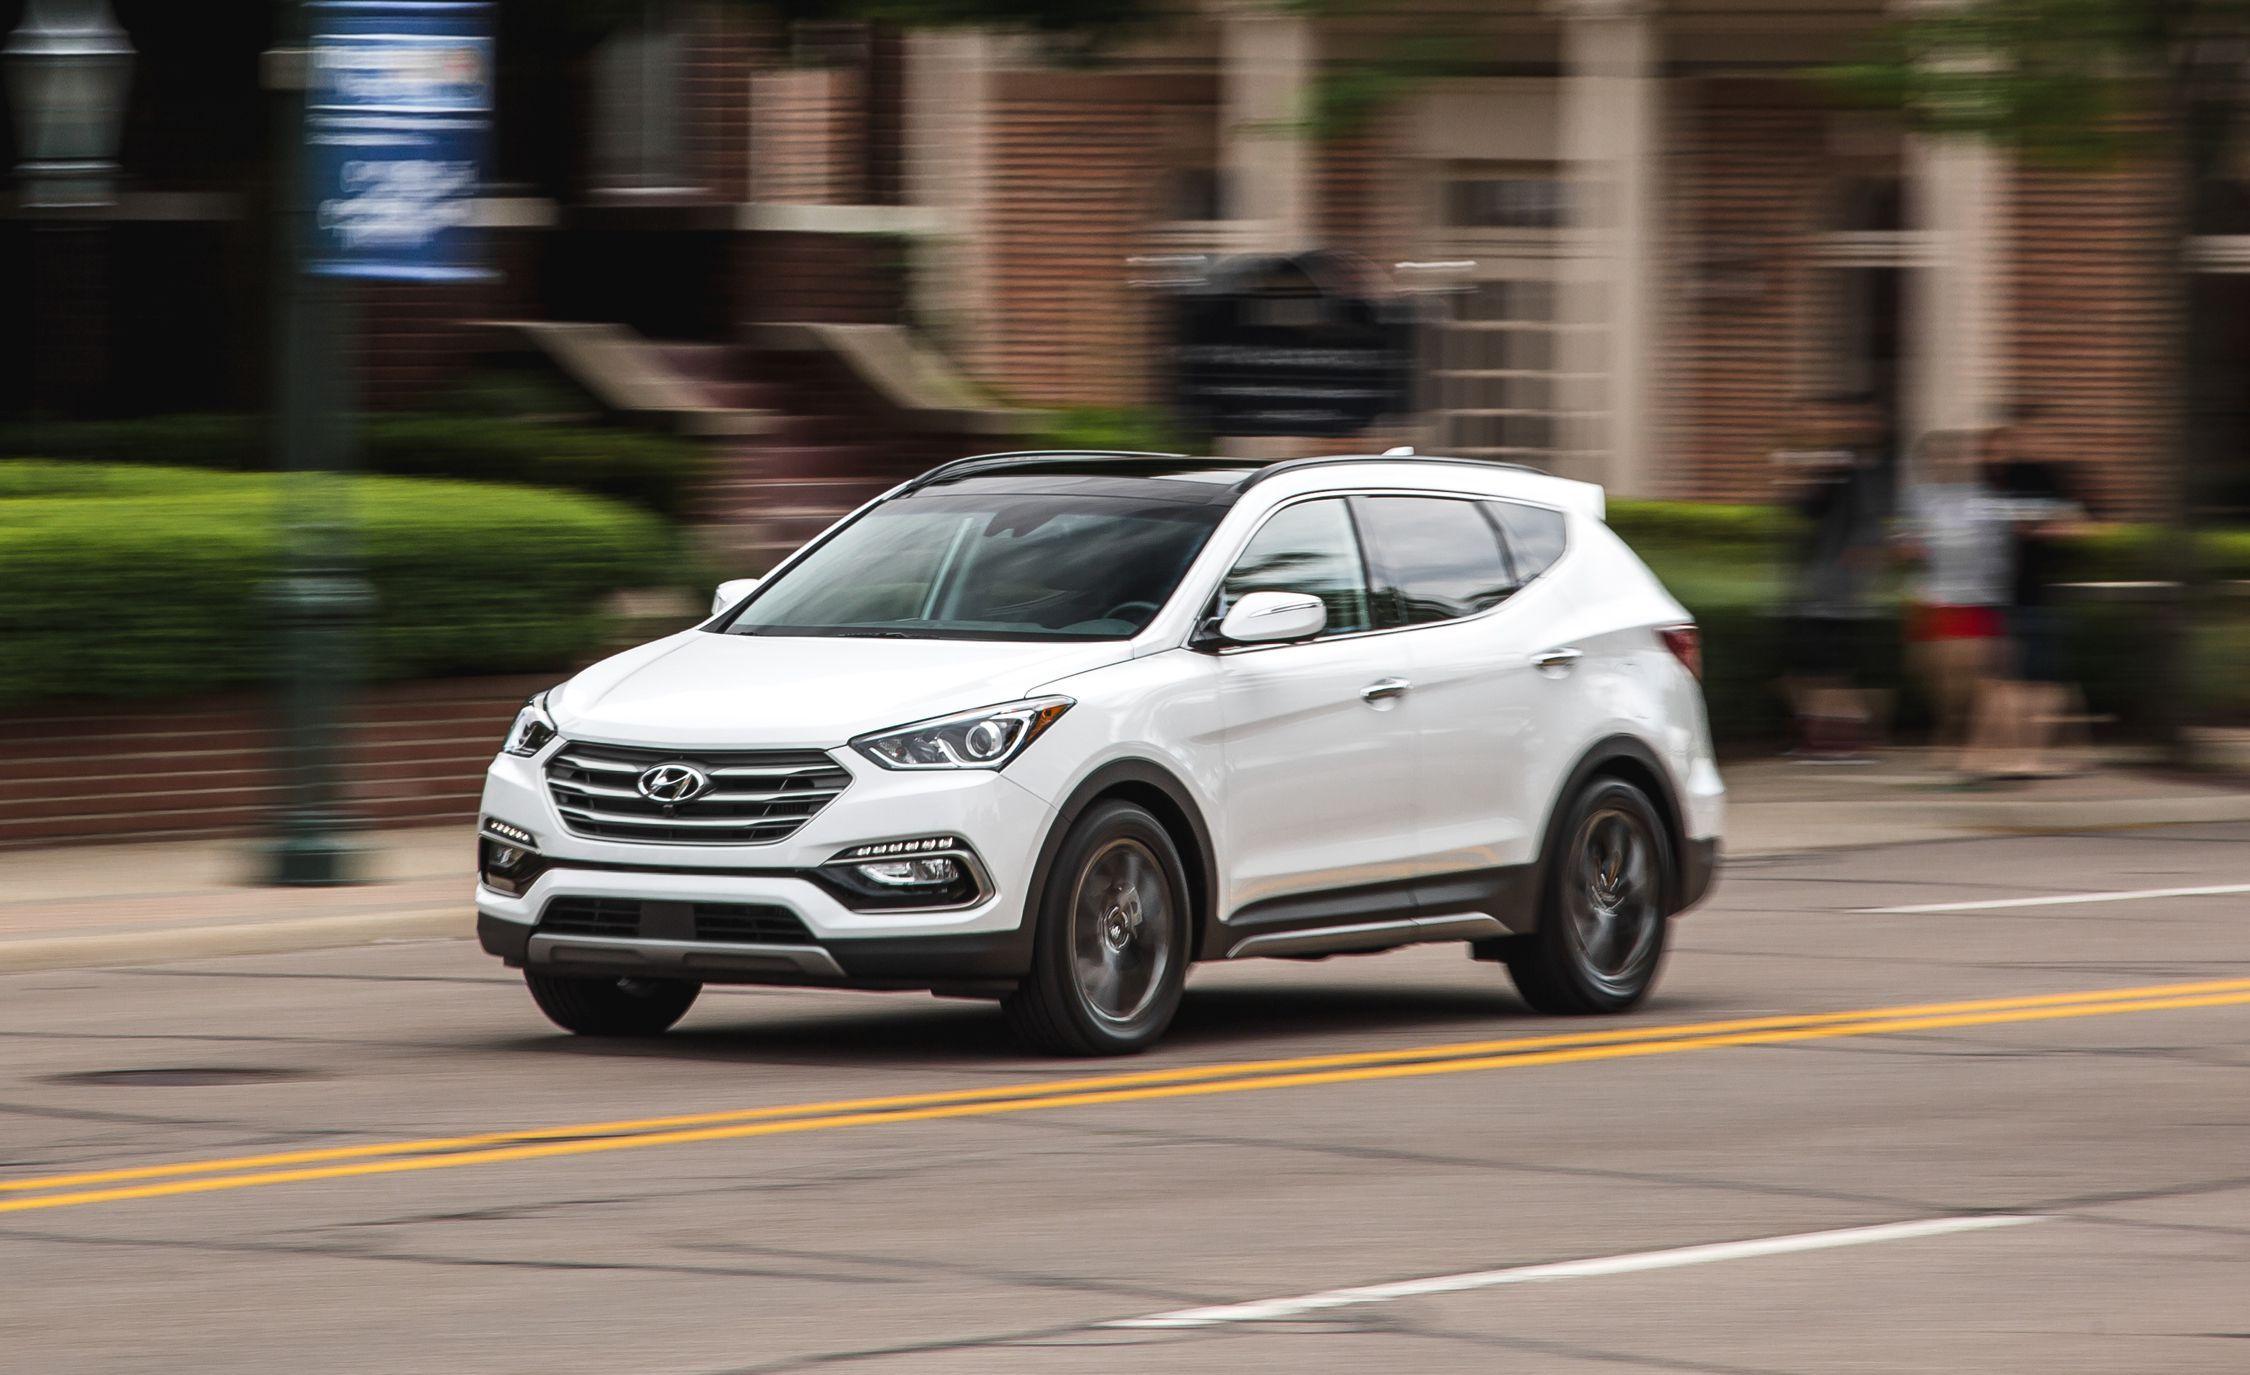 Hyundai Santa Fe Sport Features And Specs